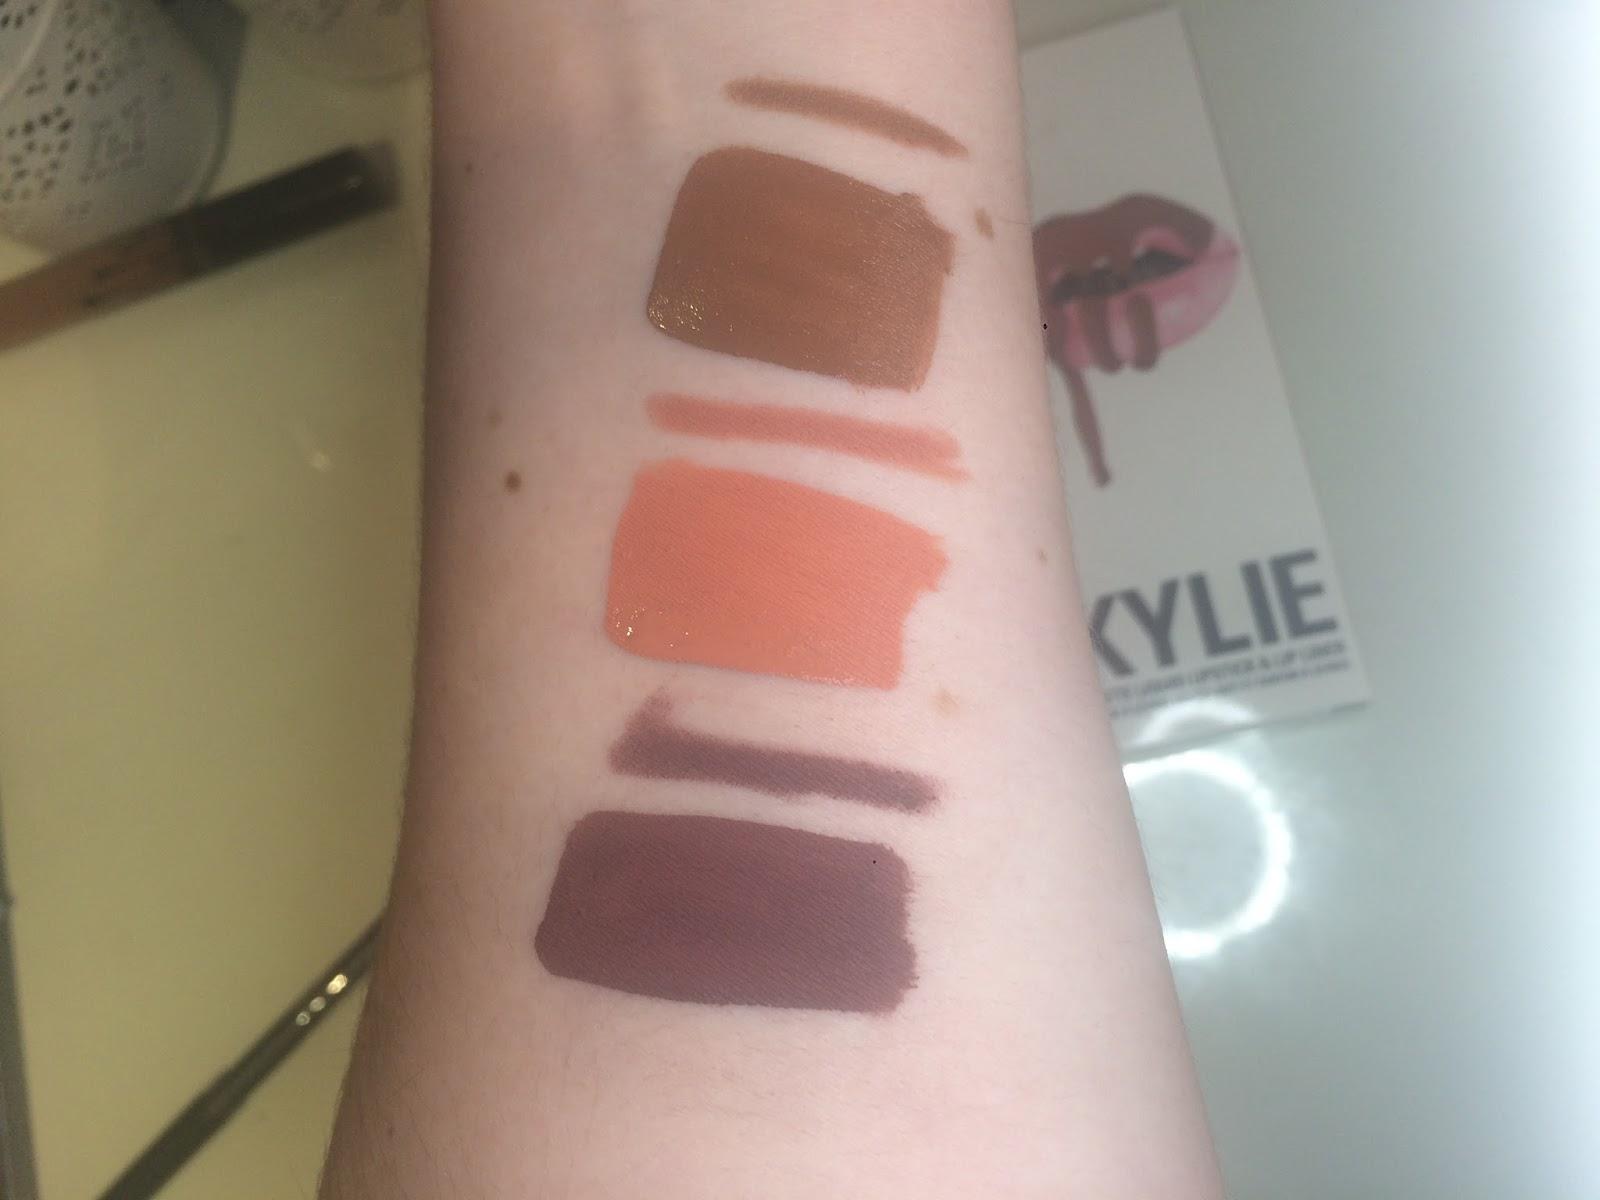 Matte Lip Kit by Kylie Cosmetics #20